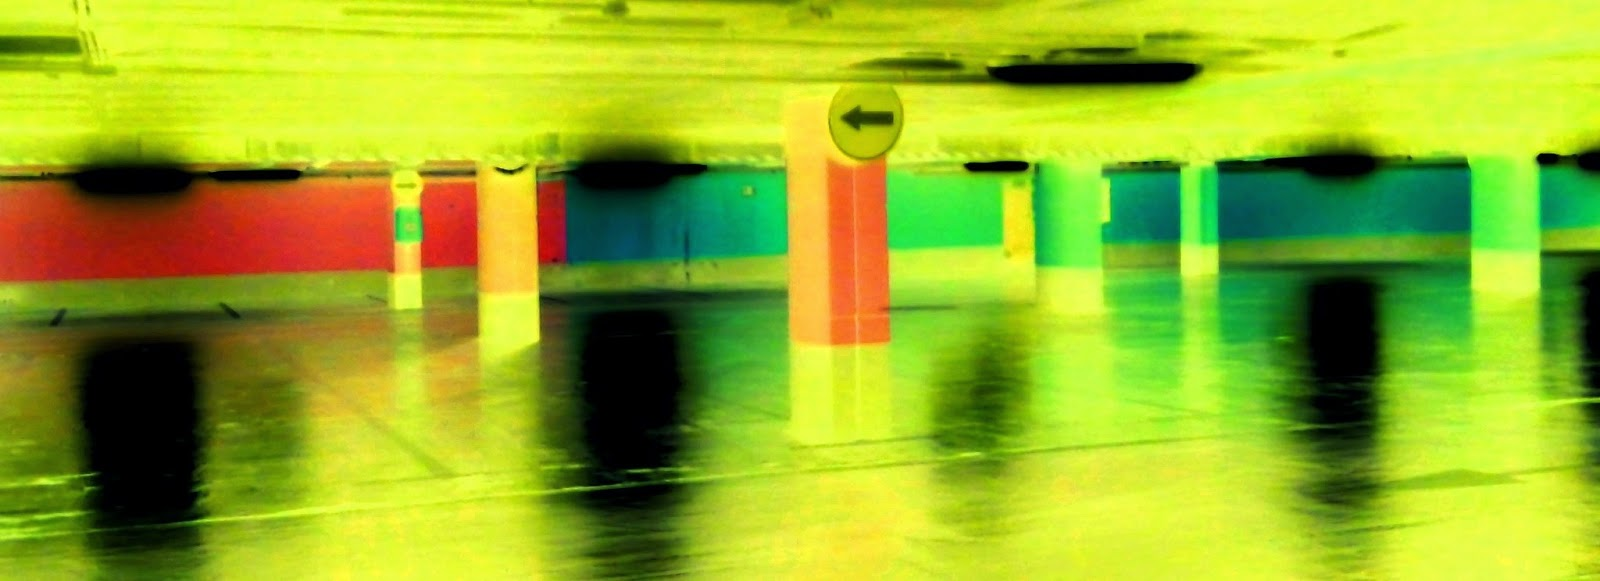 Arte contemporáneo, blog de arte, voa-gallery blogspot.com, Garry Winogrand, Fundación Mapfre, Fotografía, Photography,